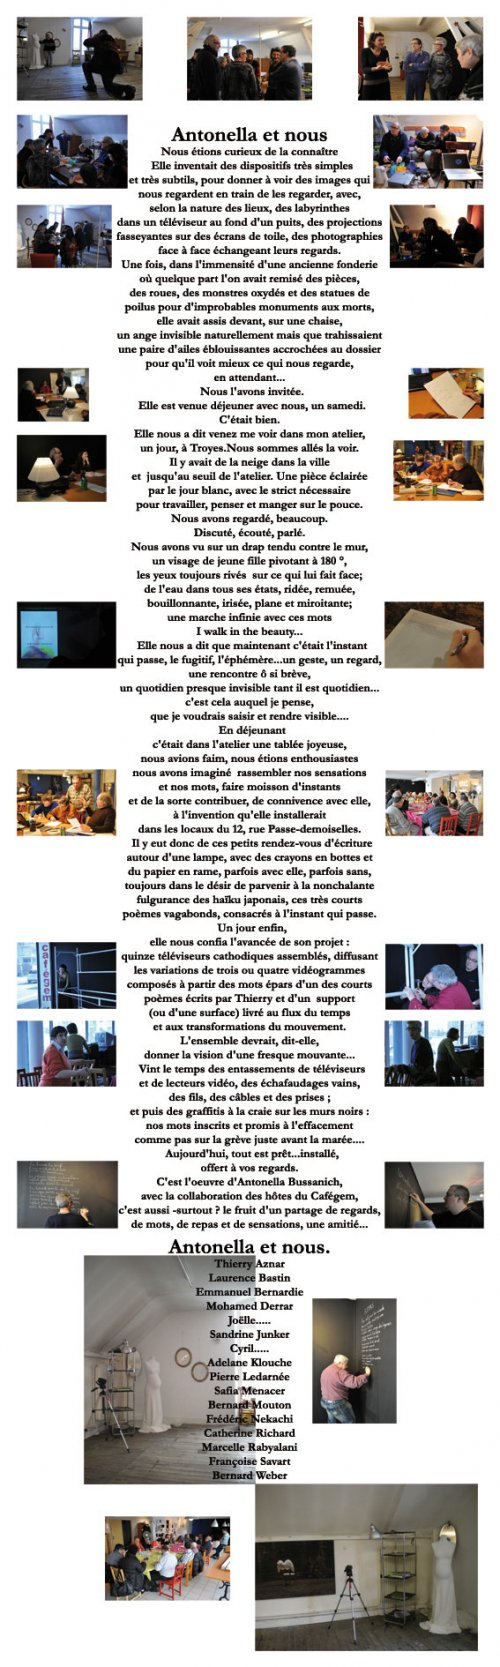 antonella_et_nous